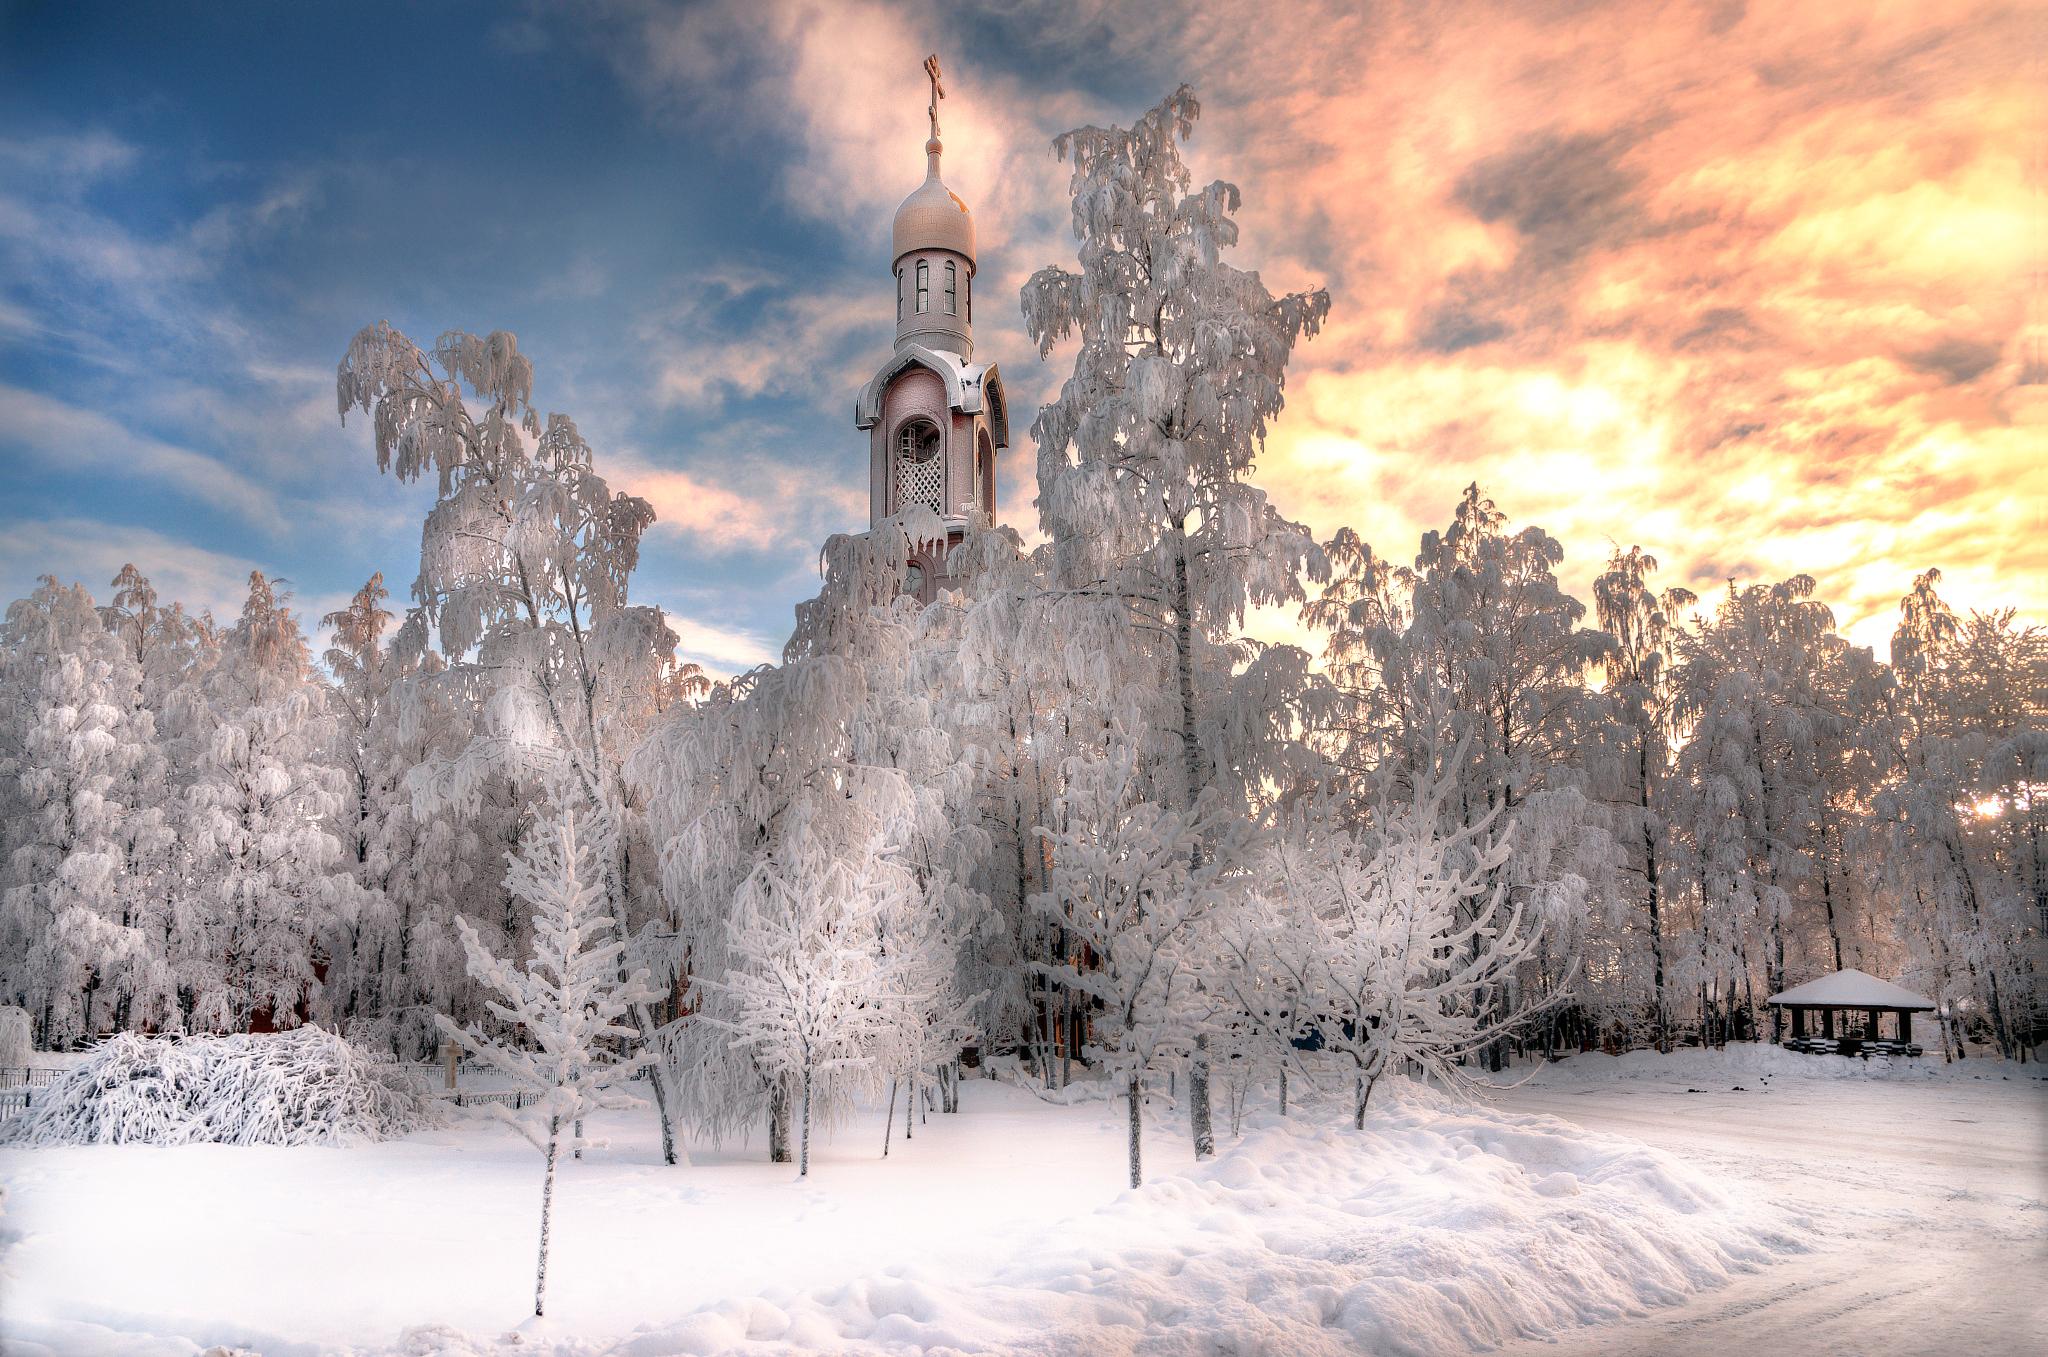 Russian Church In Winter Hd Wallpaper Background Image